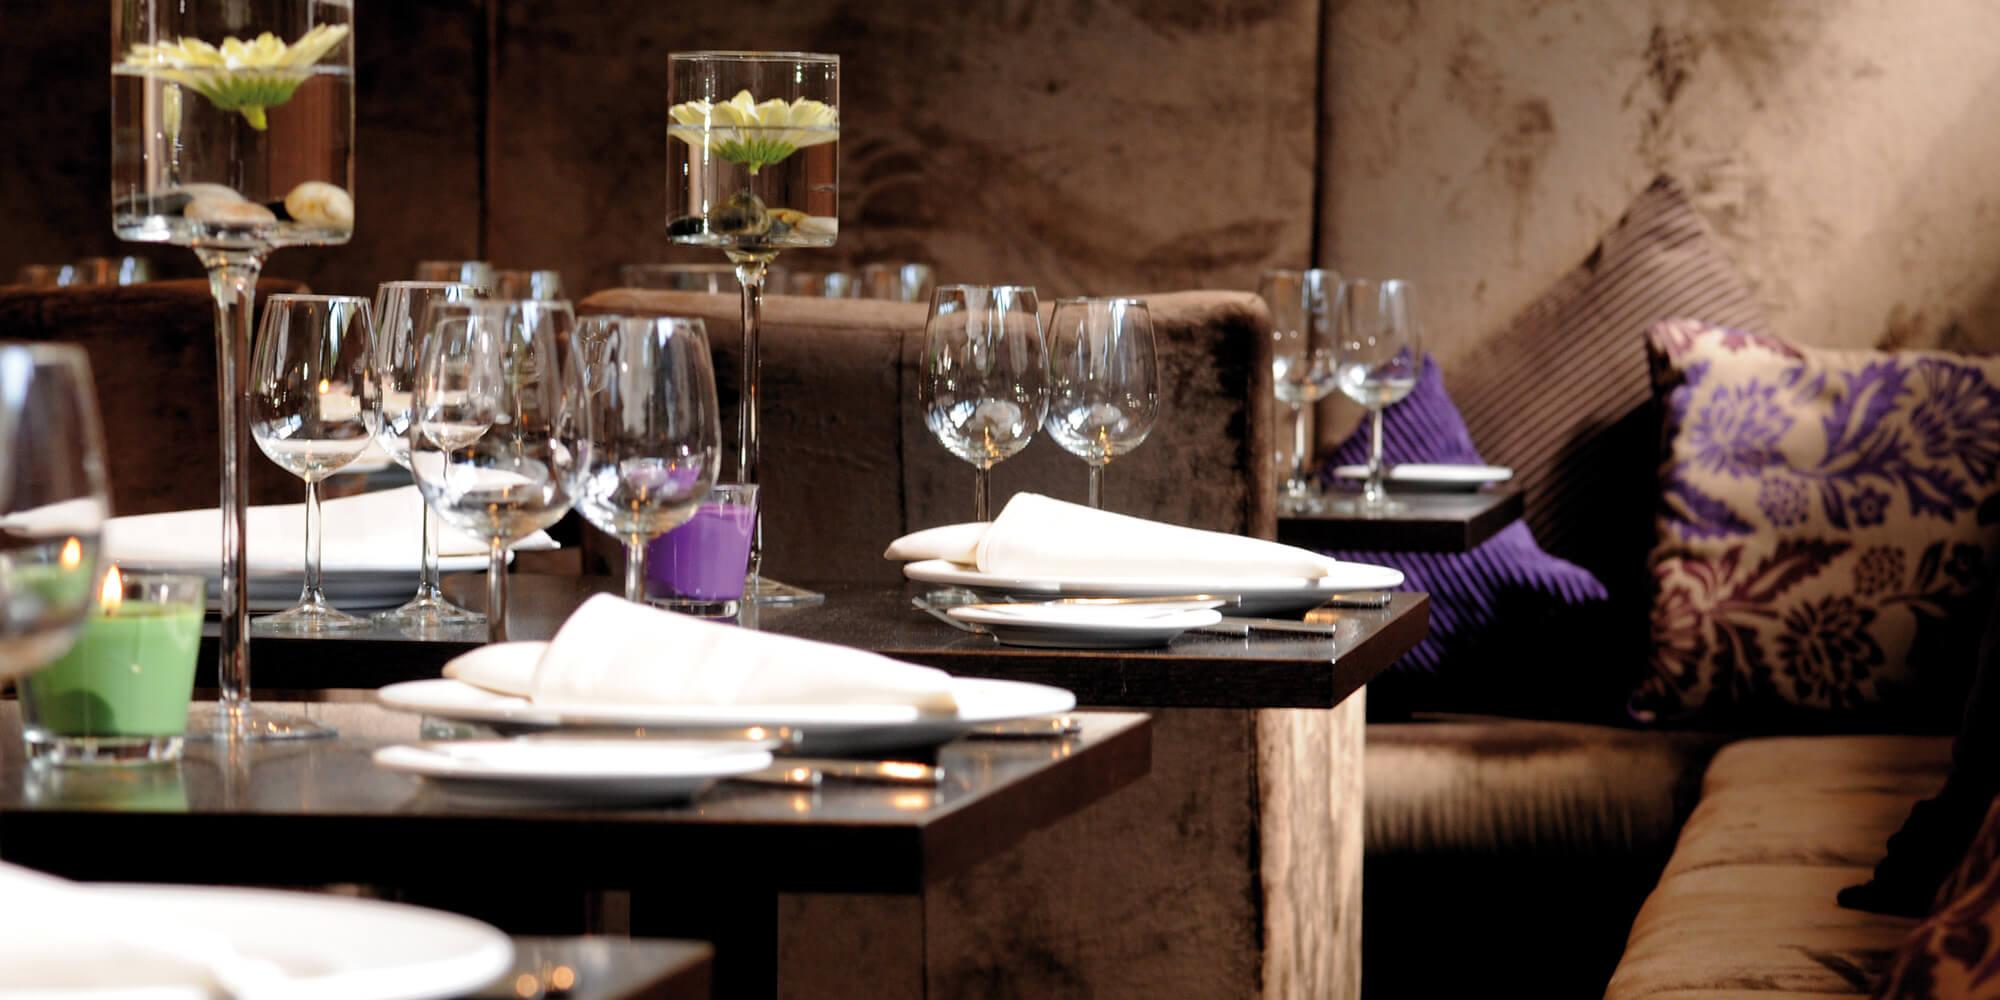 GranCanariaFoto-Hotel-Restaurant-Dirk-Holst-DHSTUDIO-391